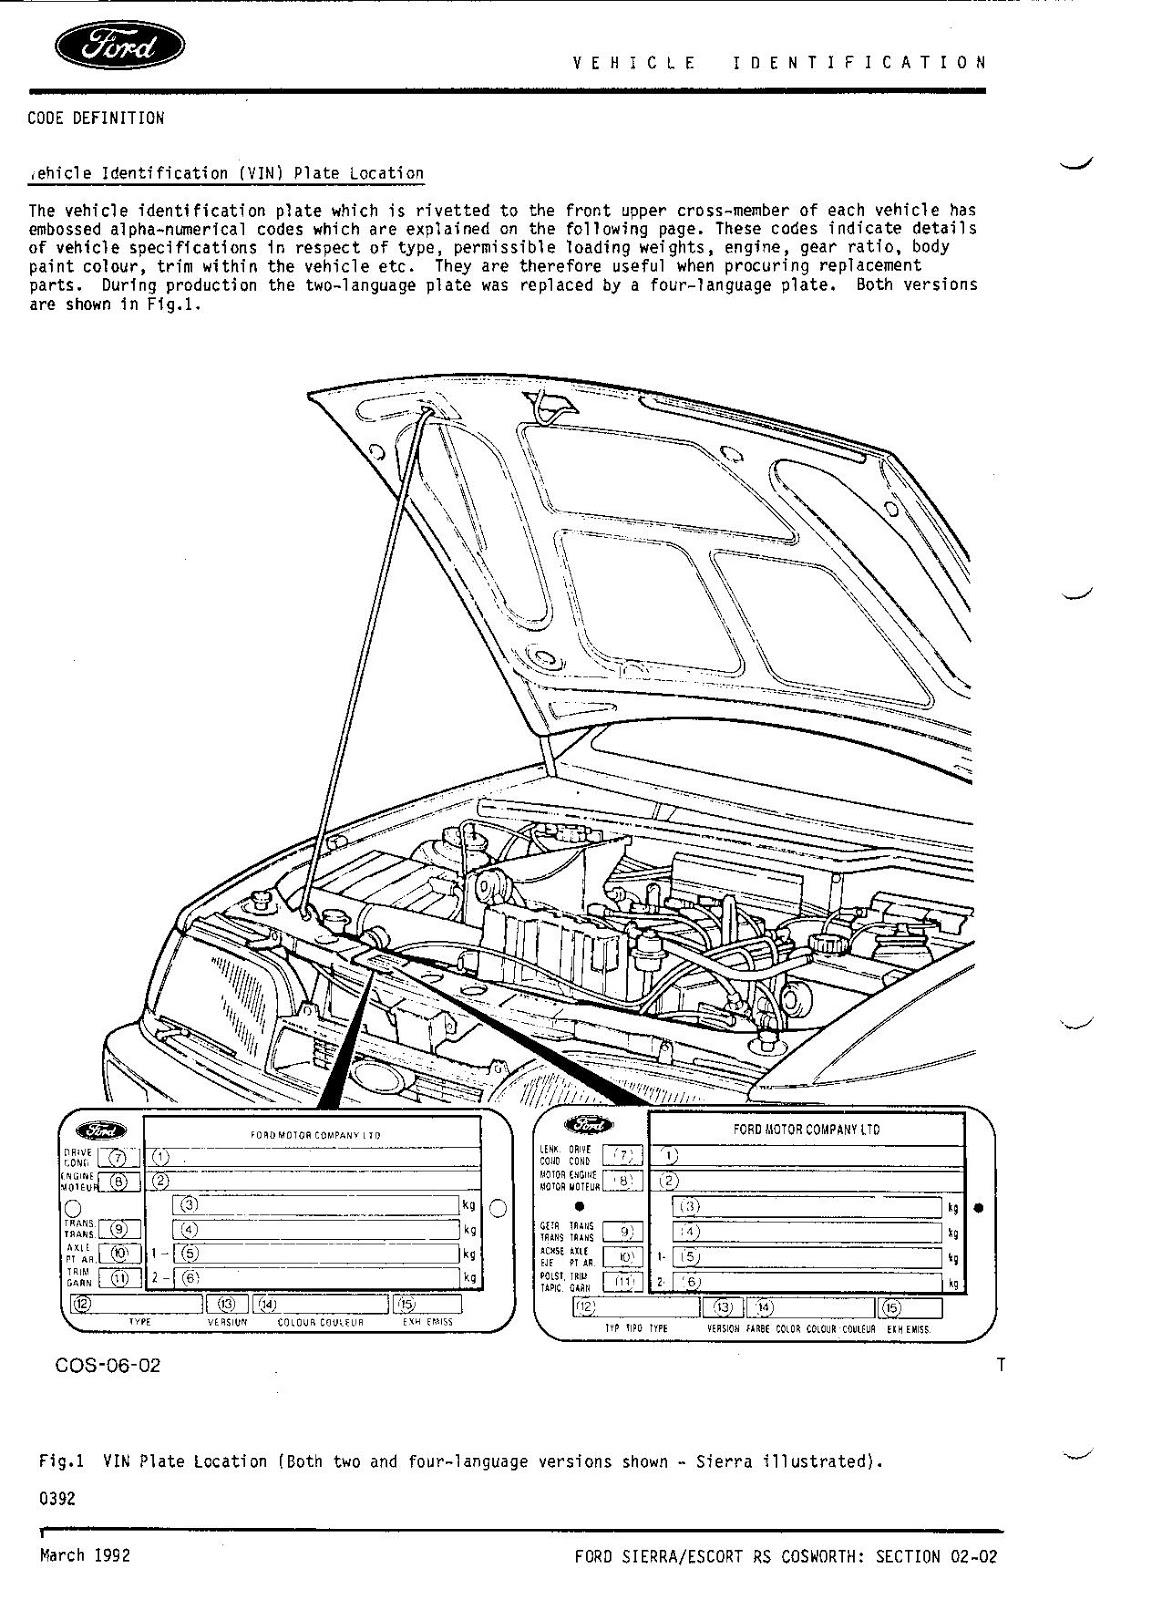 fordtopia  ford sierra sapphire cosworth identification